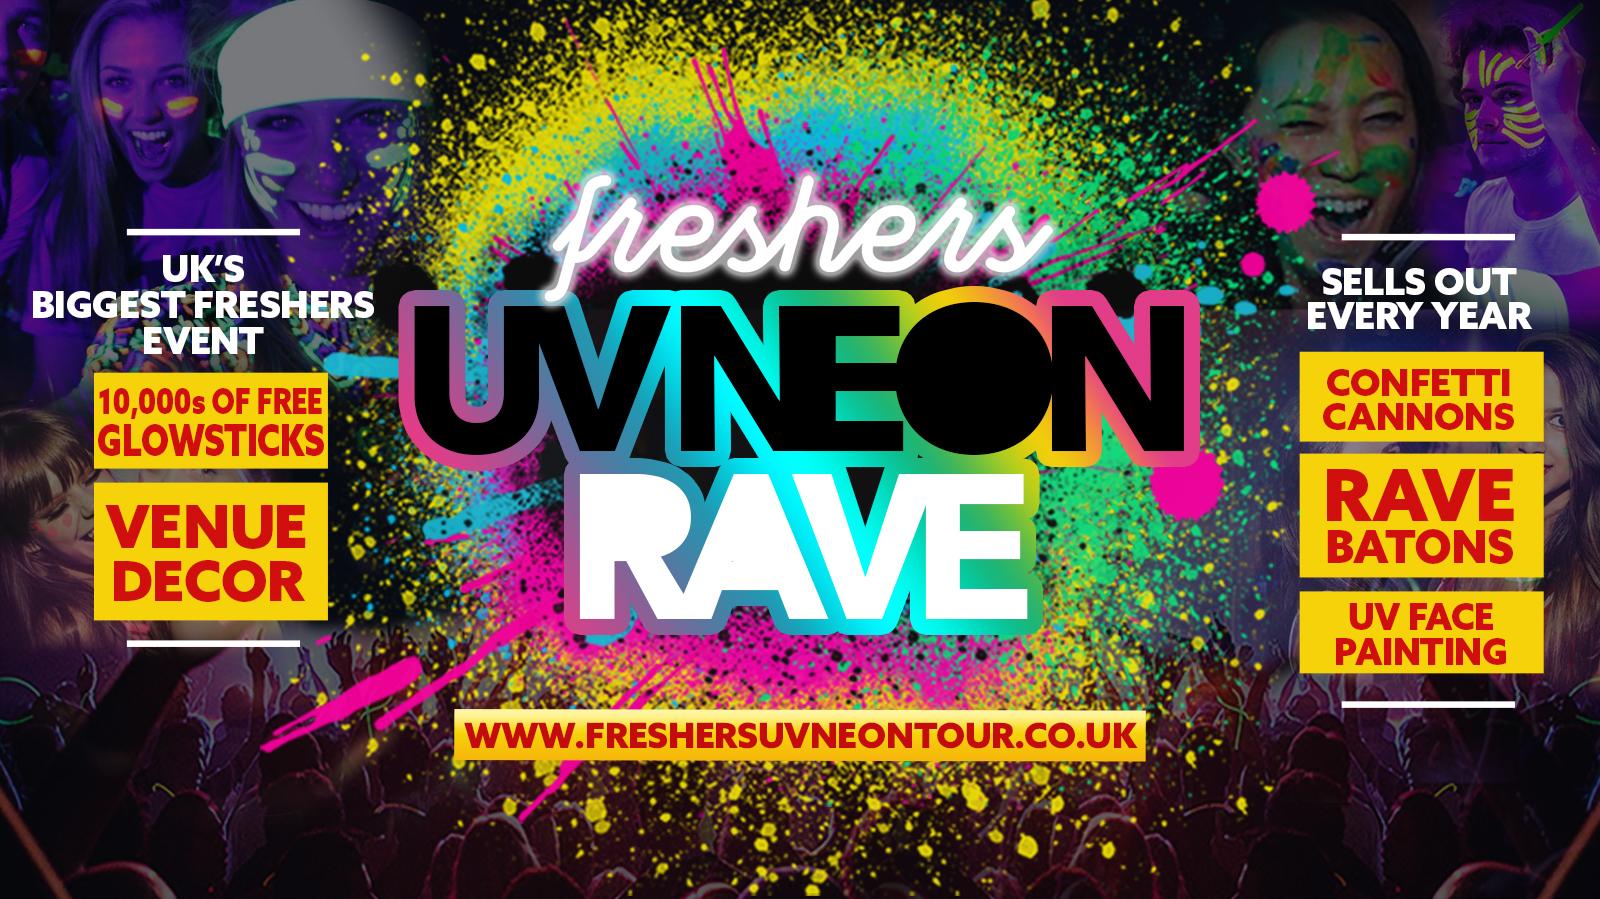 Manchester Freshers UV Neon Rave | Manchester Freshers 2021 – Week 2